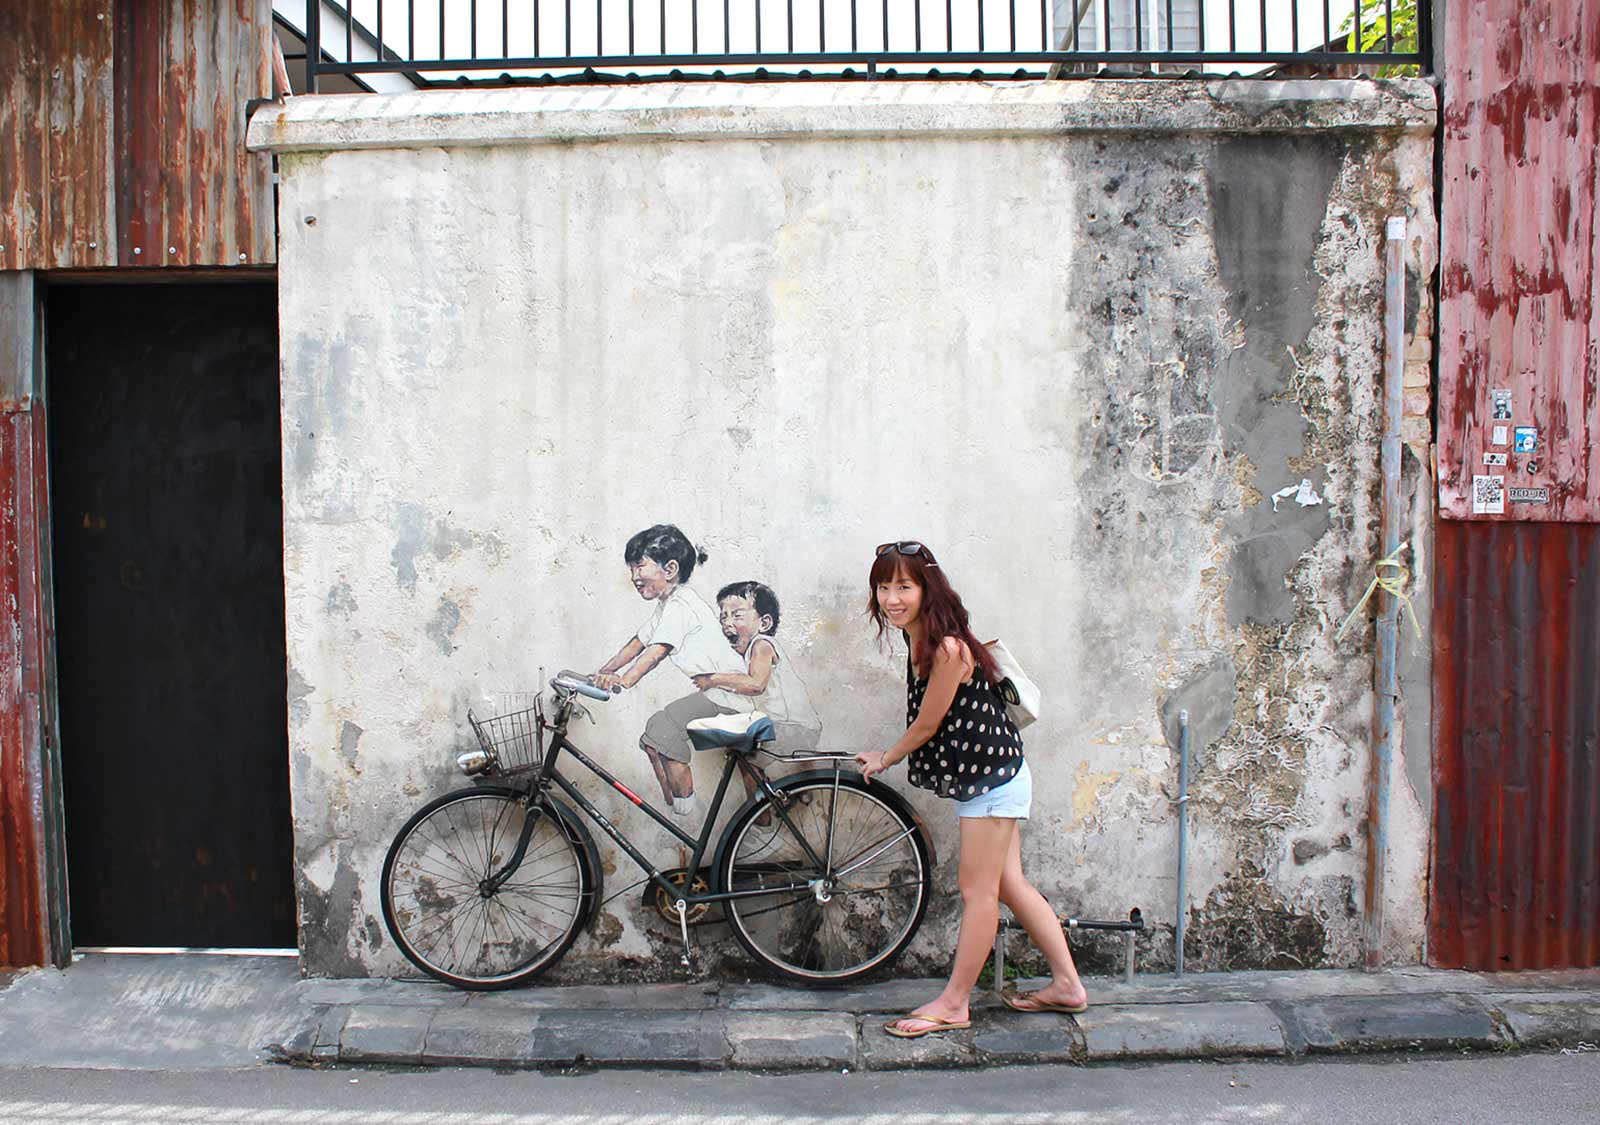 Penang S Street Art In 15 Photos The Petite Wanderess